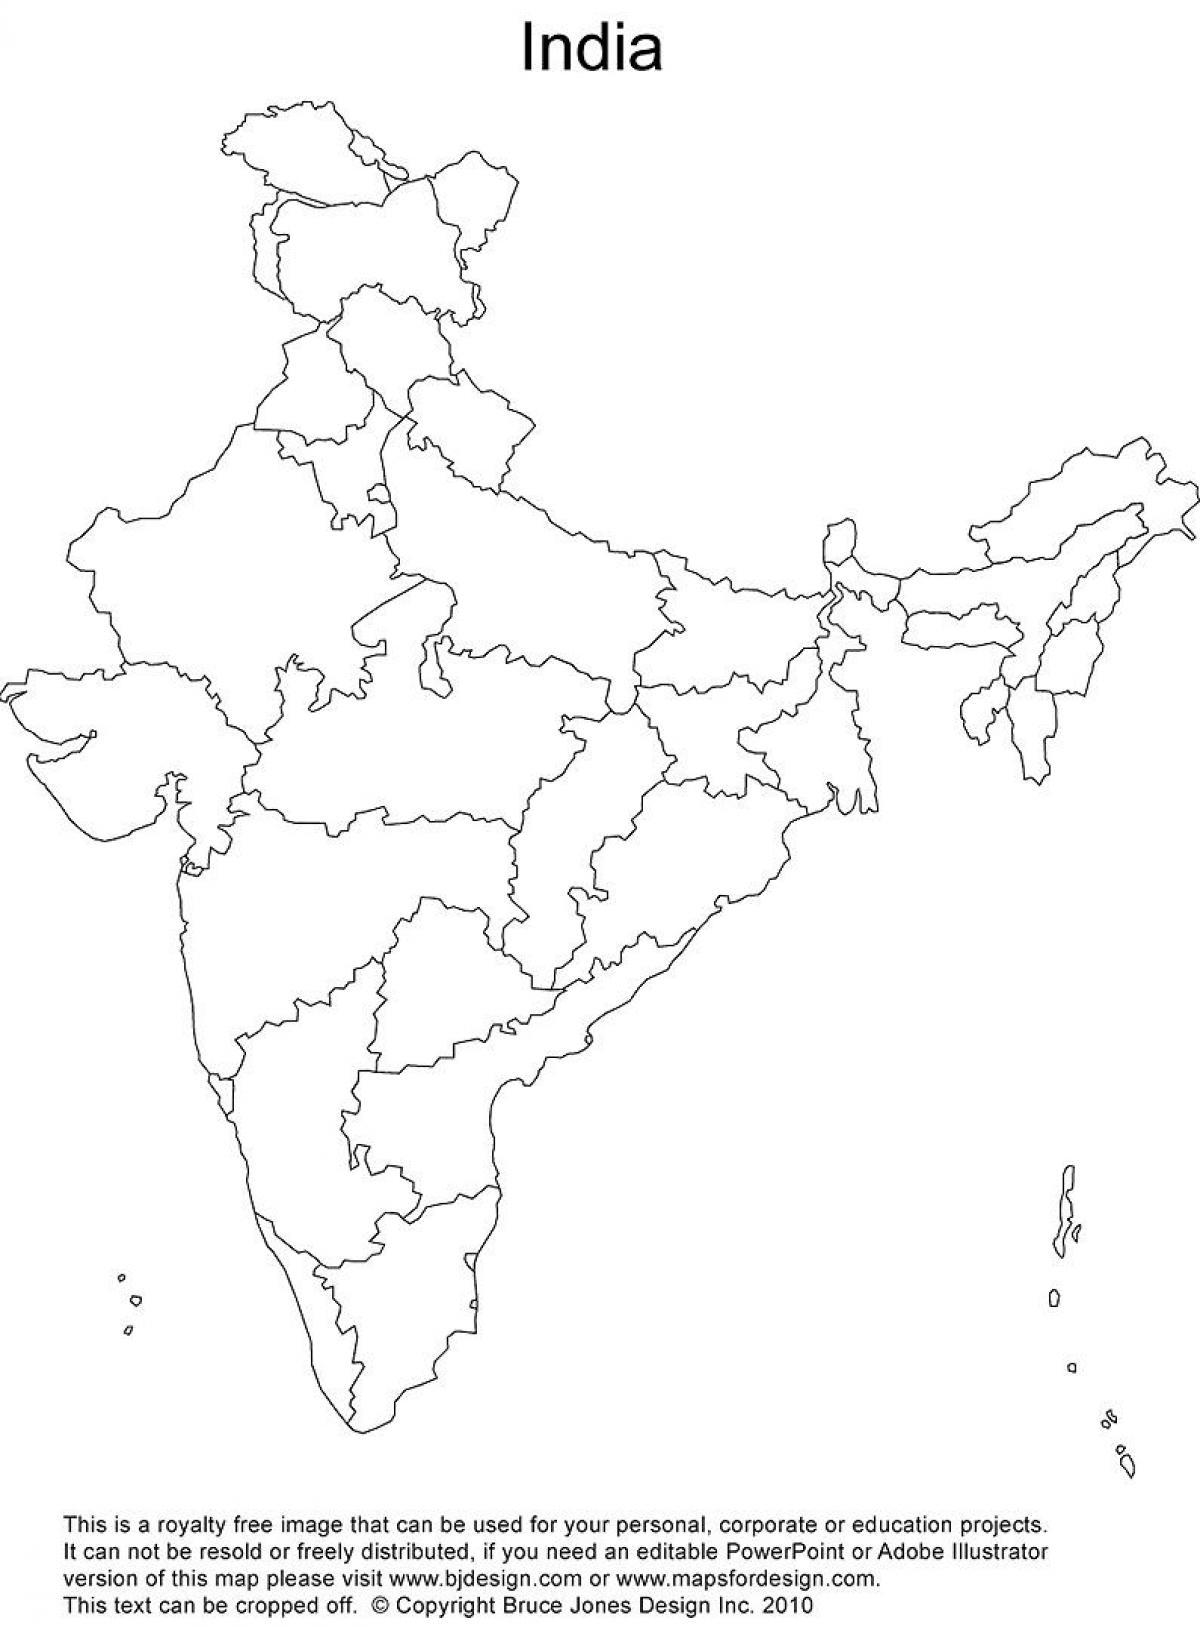 Prazdne Indie Politicke Mape Slepa Mapa Indie Politicke Jizni